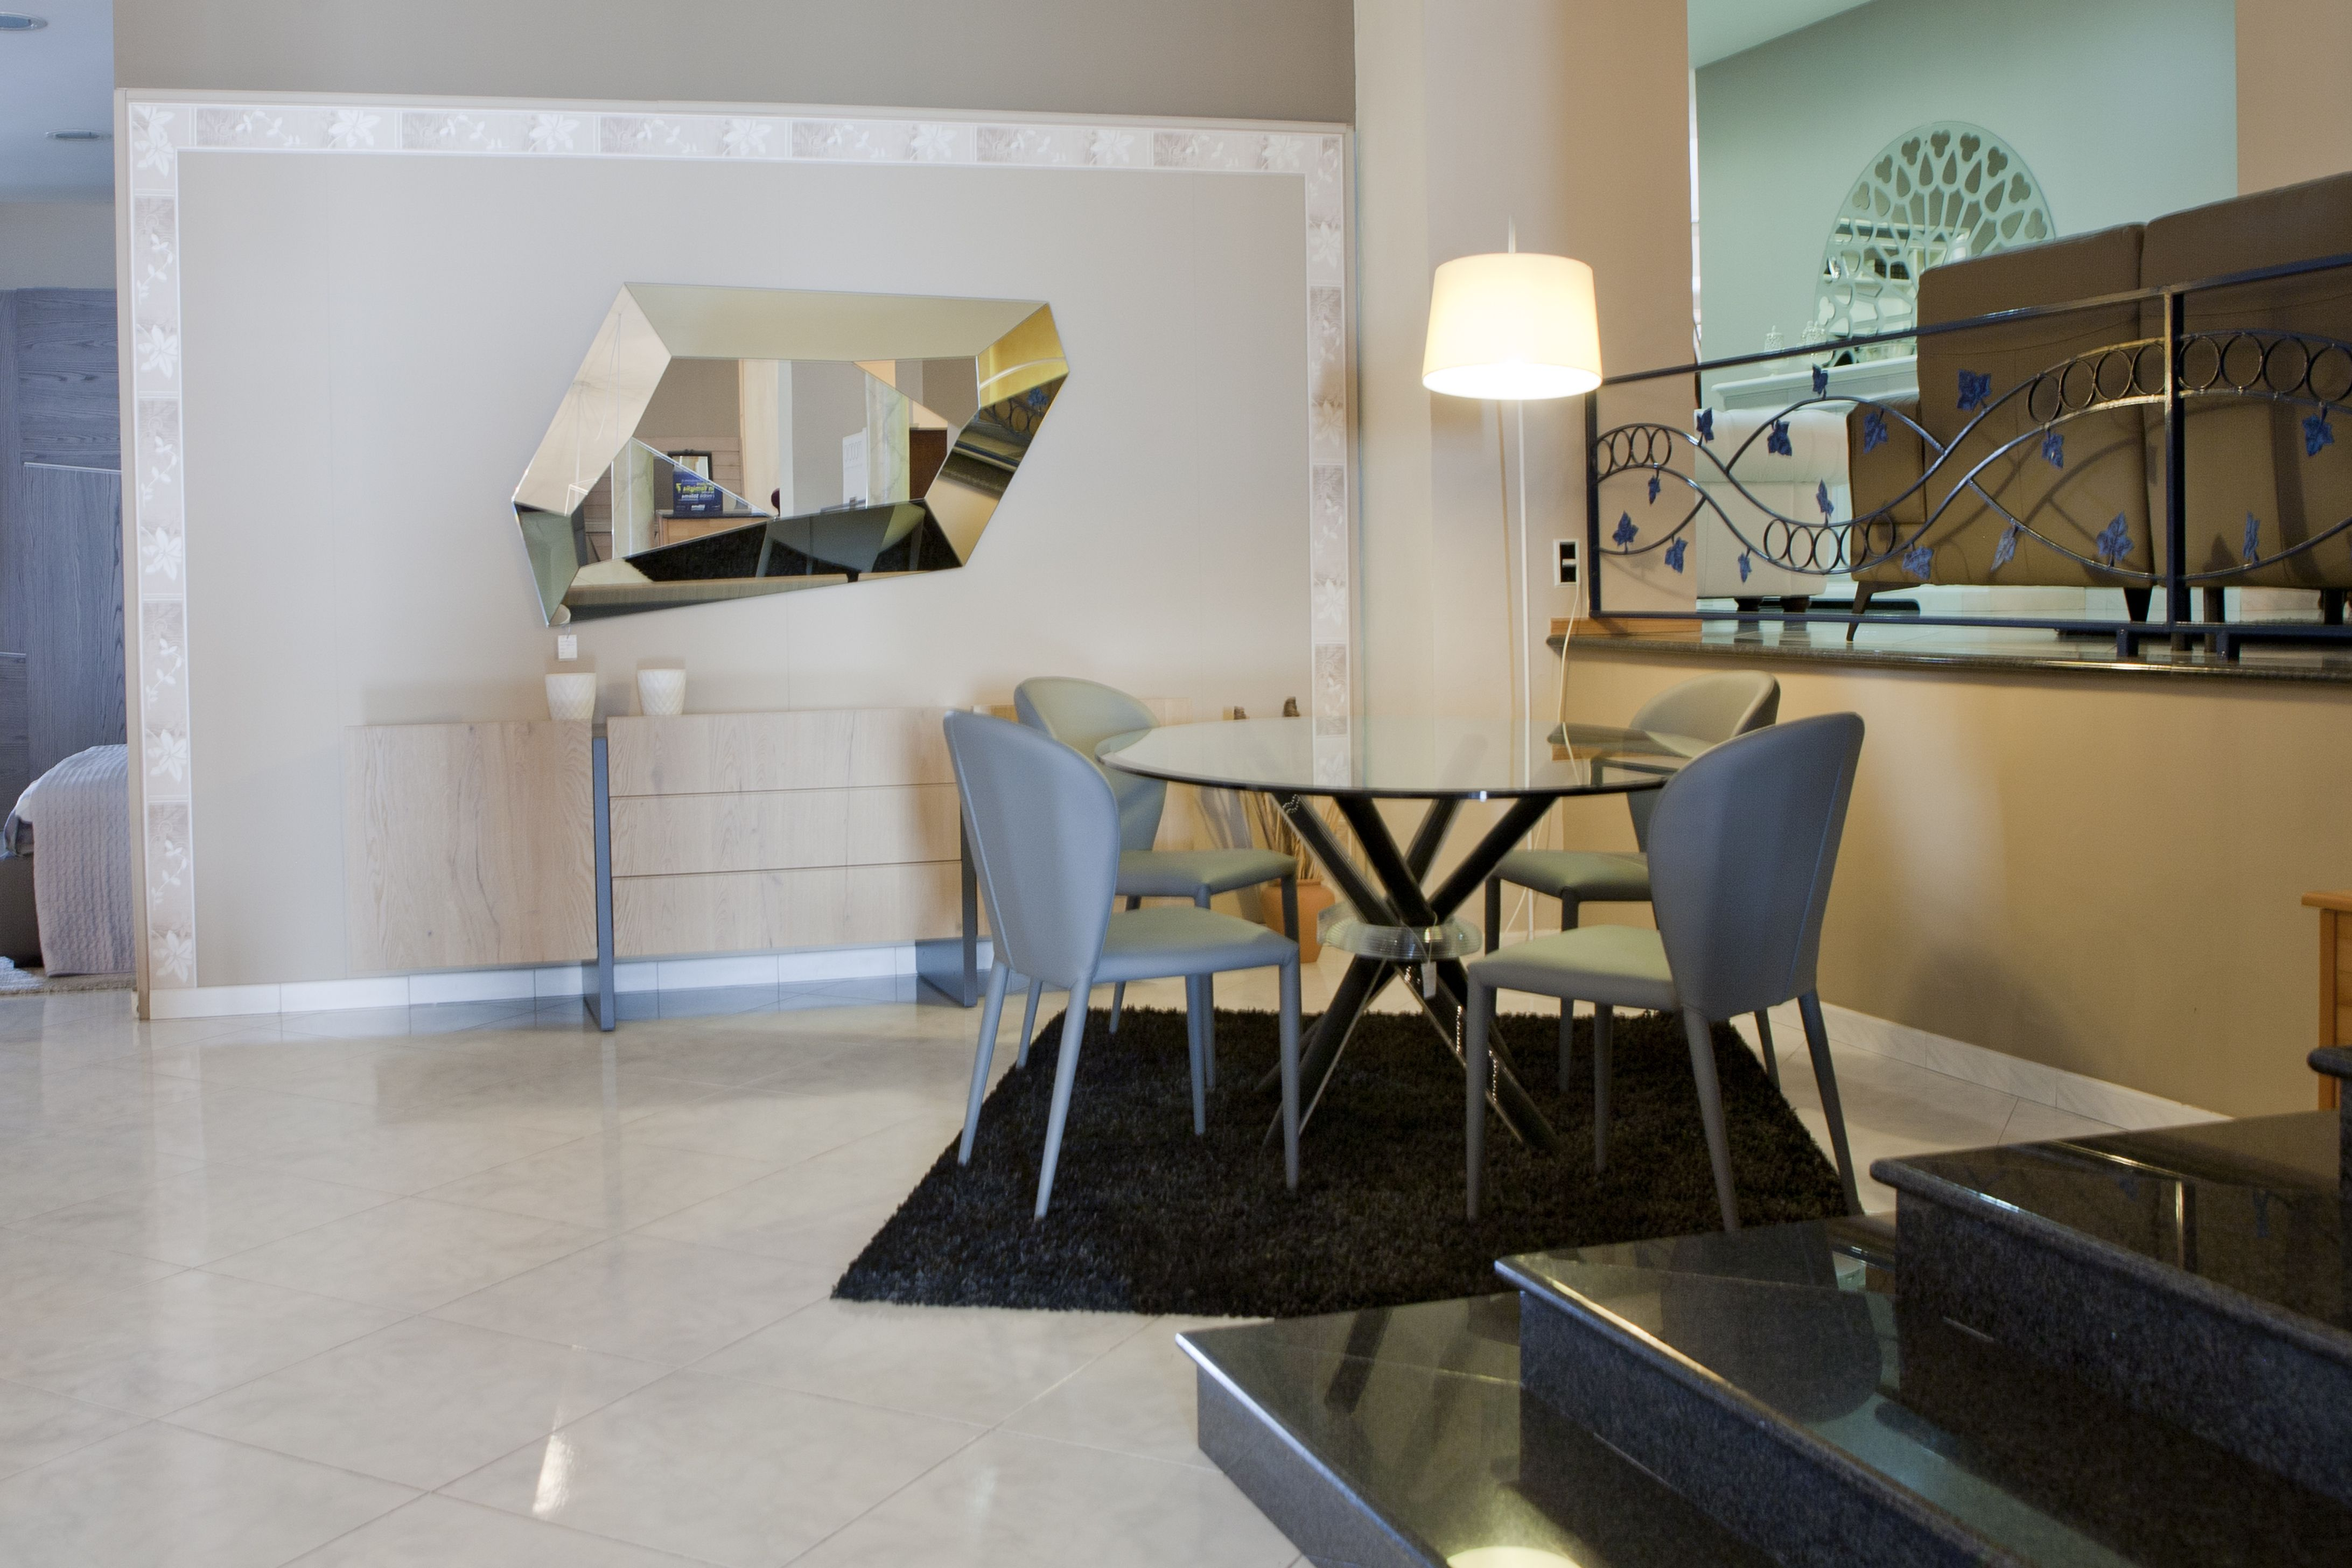 madia #arredamento #living #interni #ideas #showroom #shabby ... - Living Soggiorno Cucina